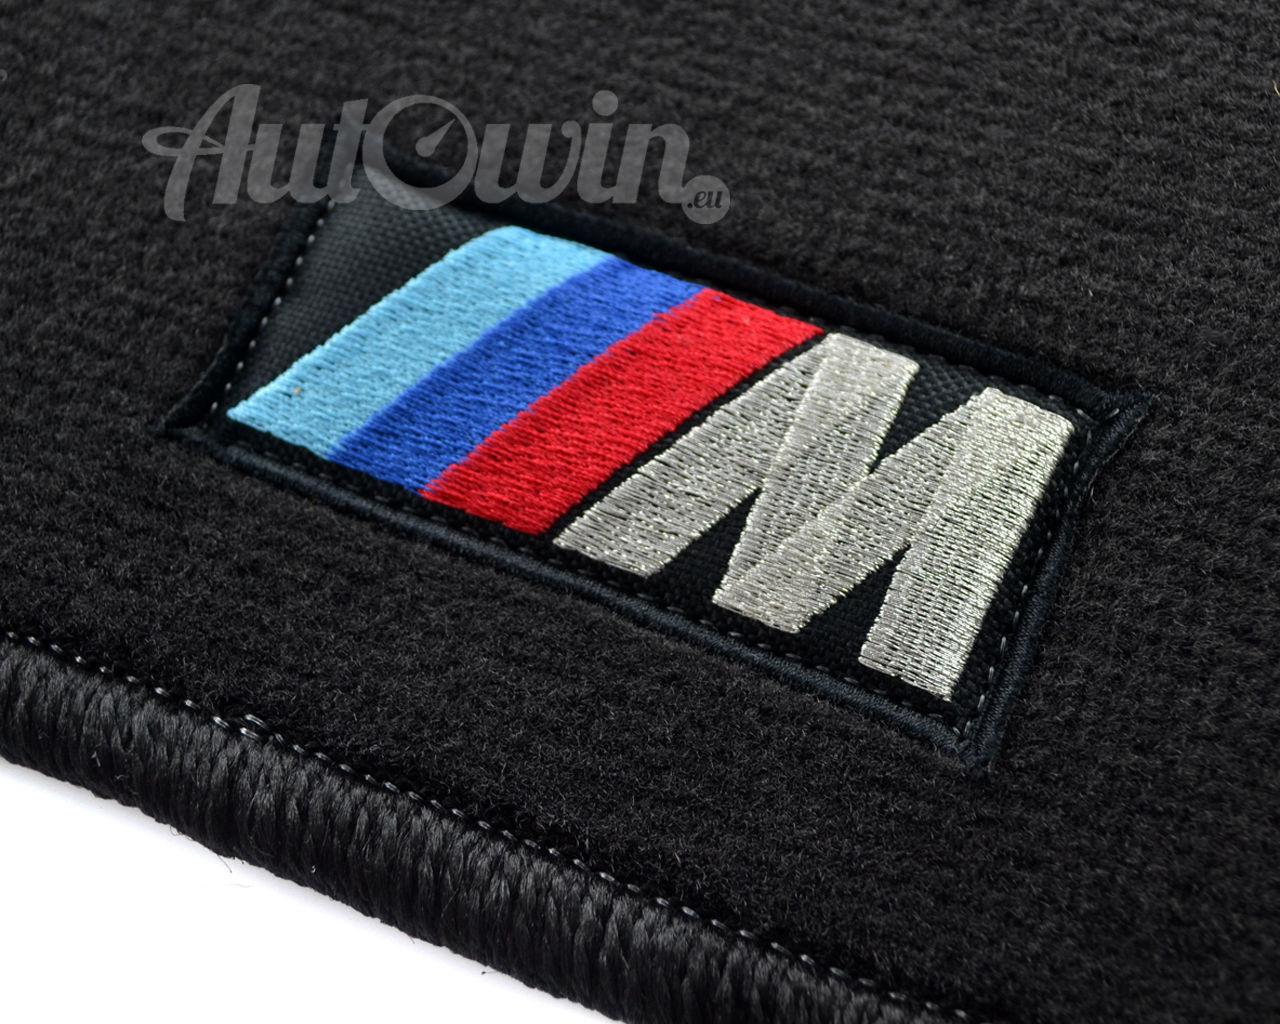 Amazing Bmw M Floor Mats With M Emblem Usa Vehicle Tailored 1990